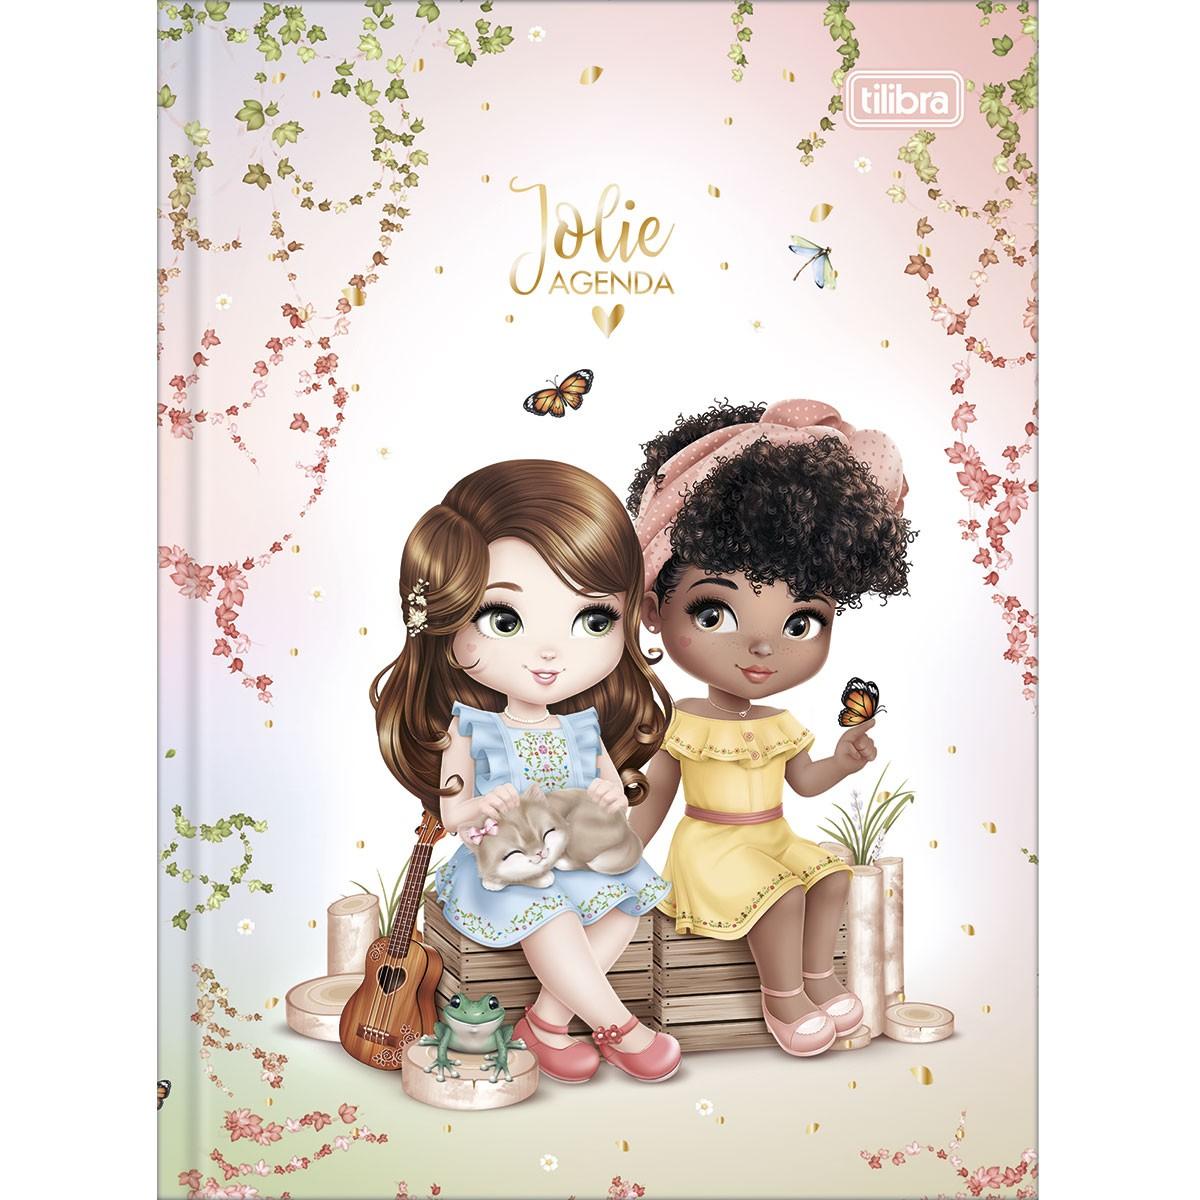 Agenda Permanente Jolie Above All Love Costurada - Tilibra